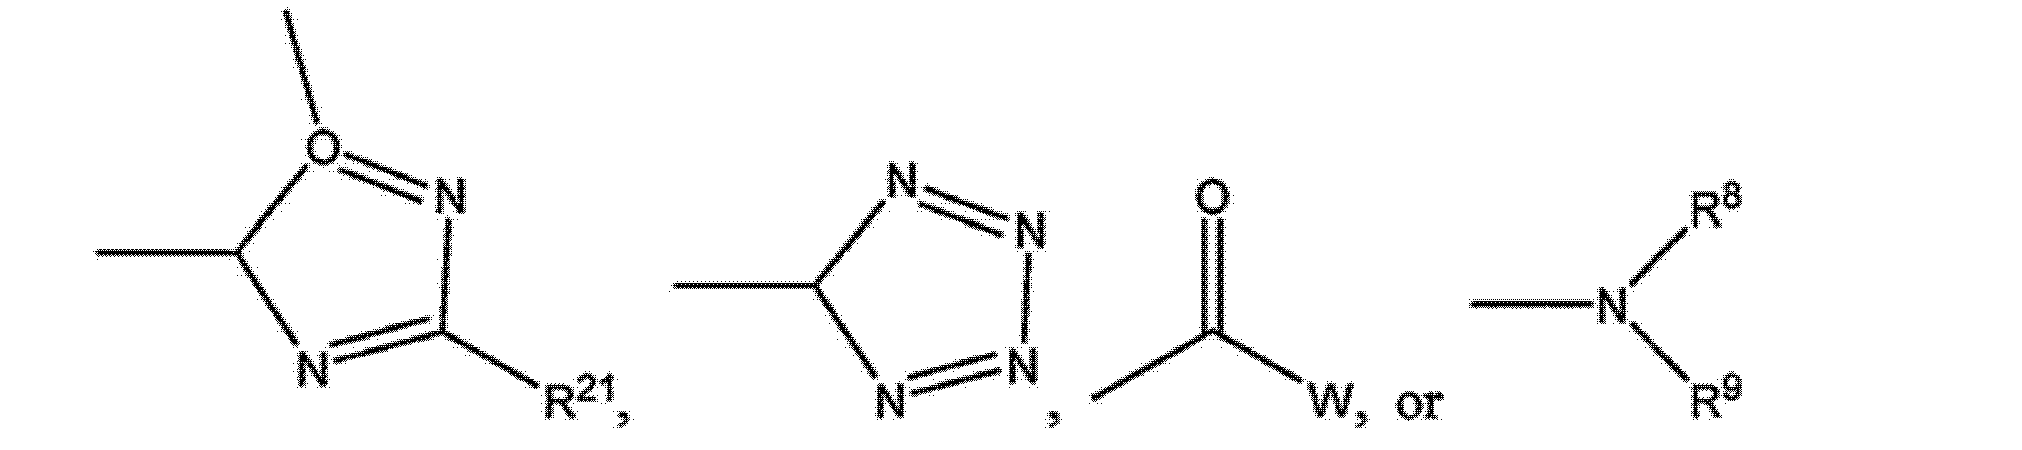 Figure CN104248763AD00151